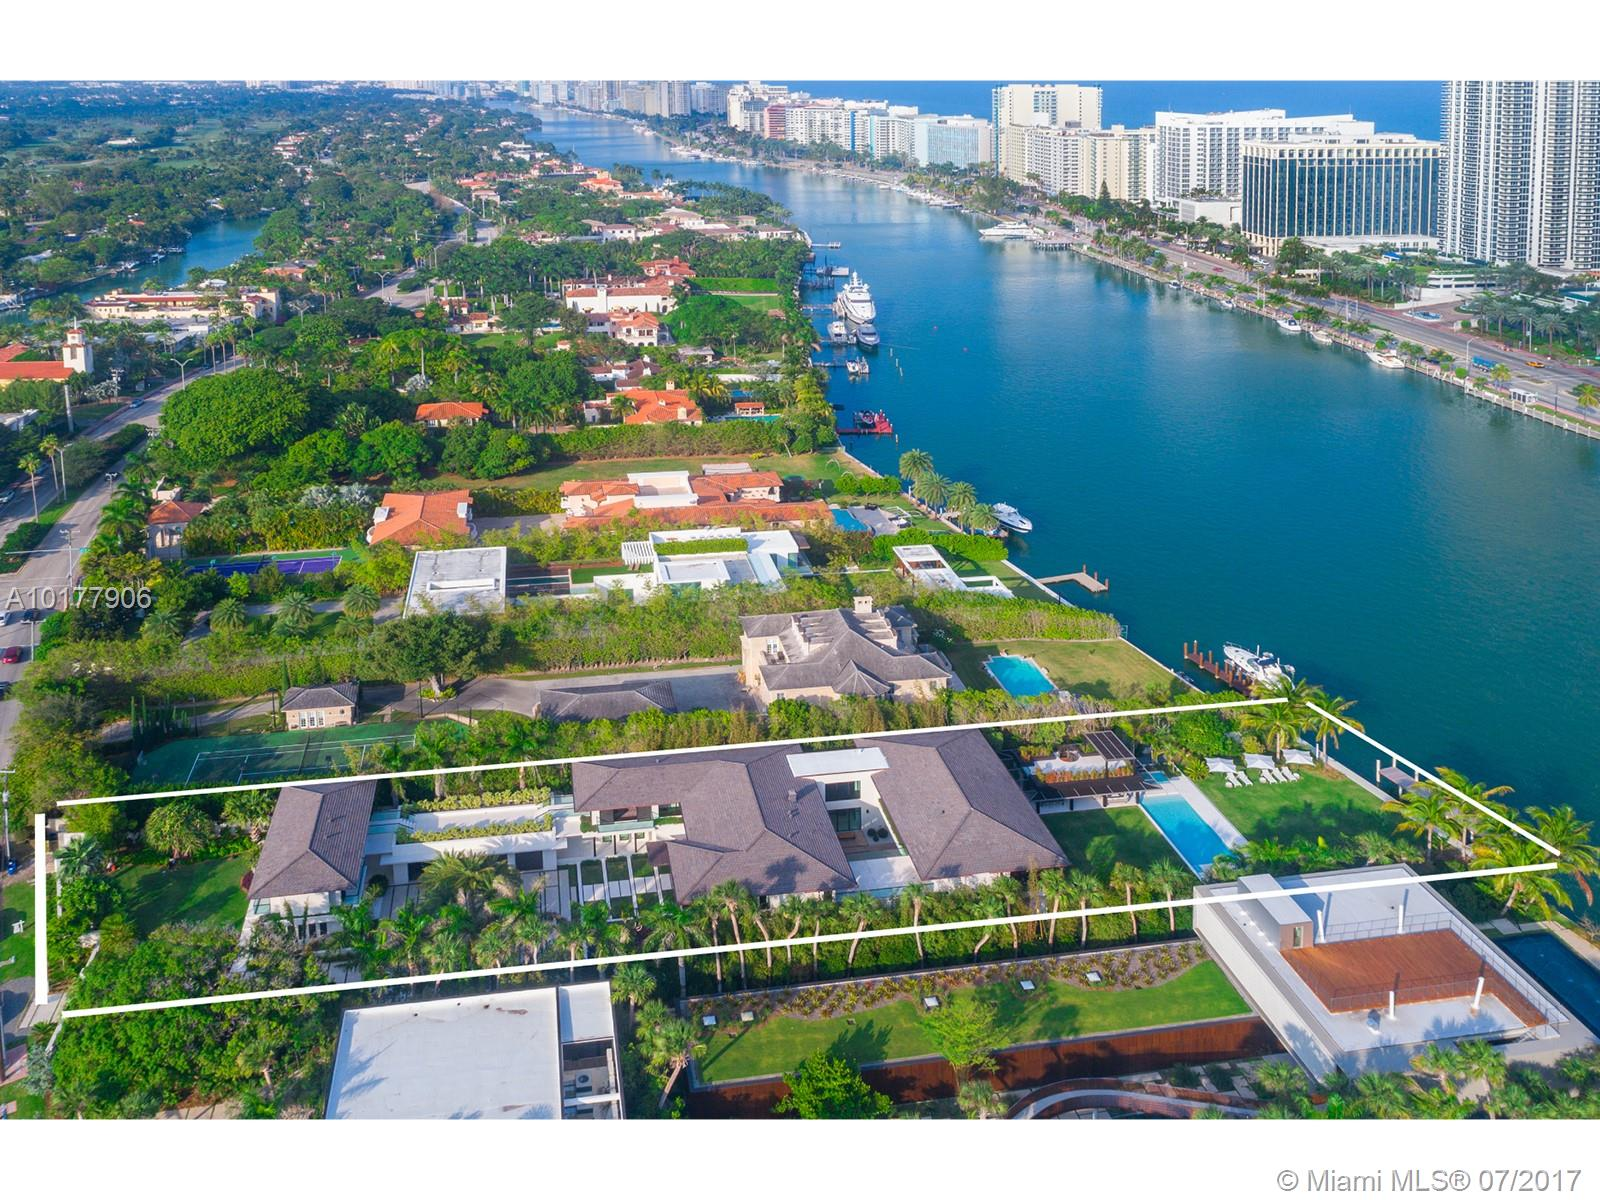 4609 Pine Tree Dr, Miami Beach , FL 33140